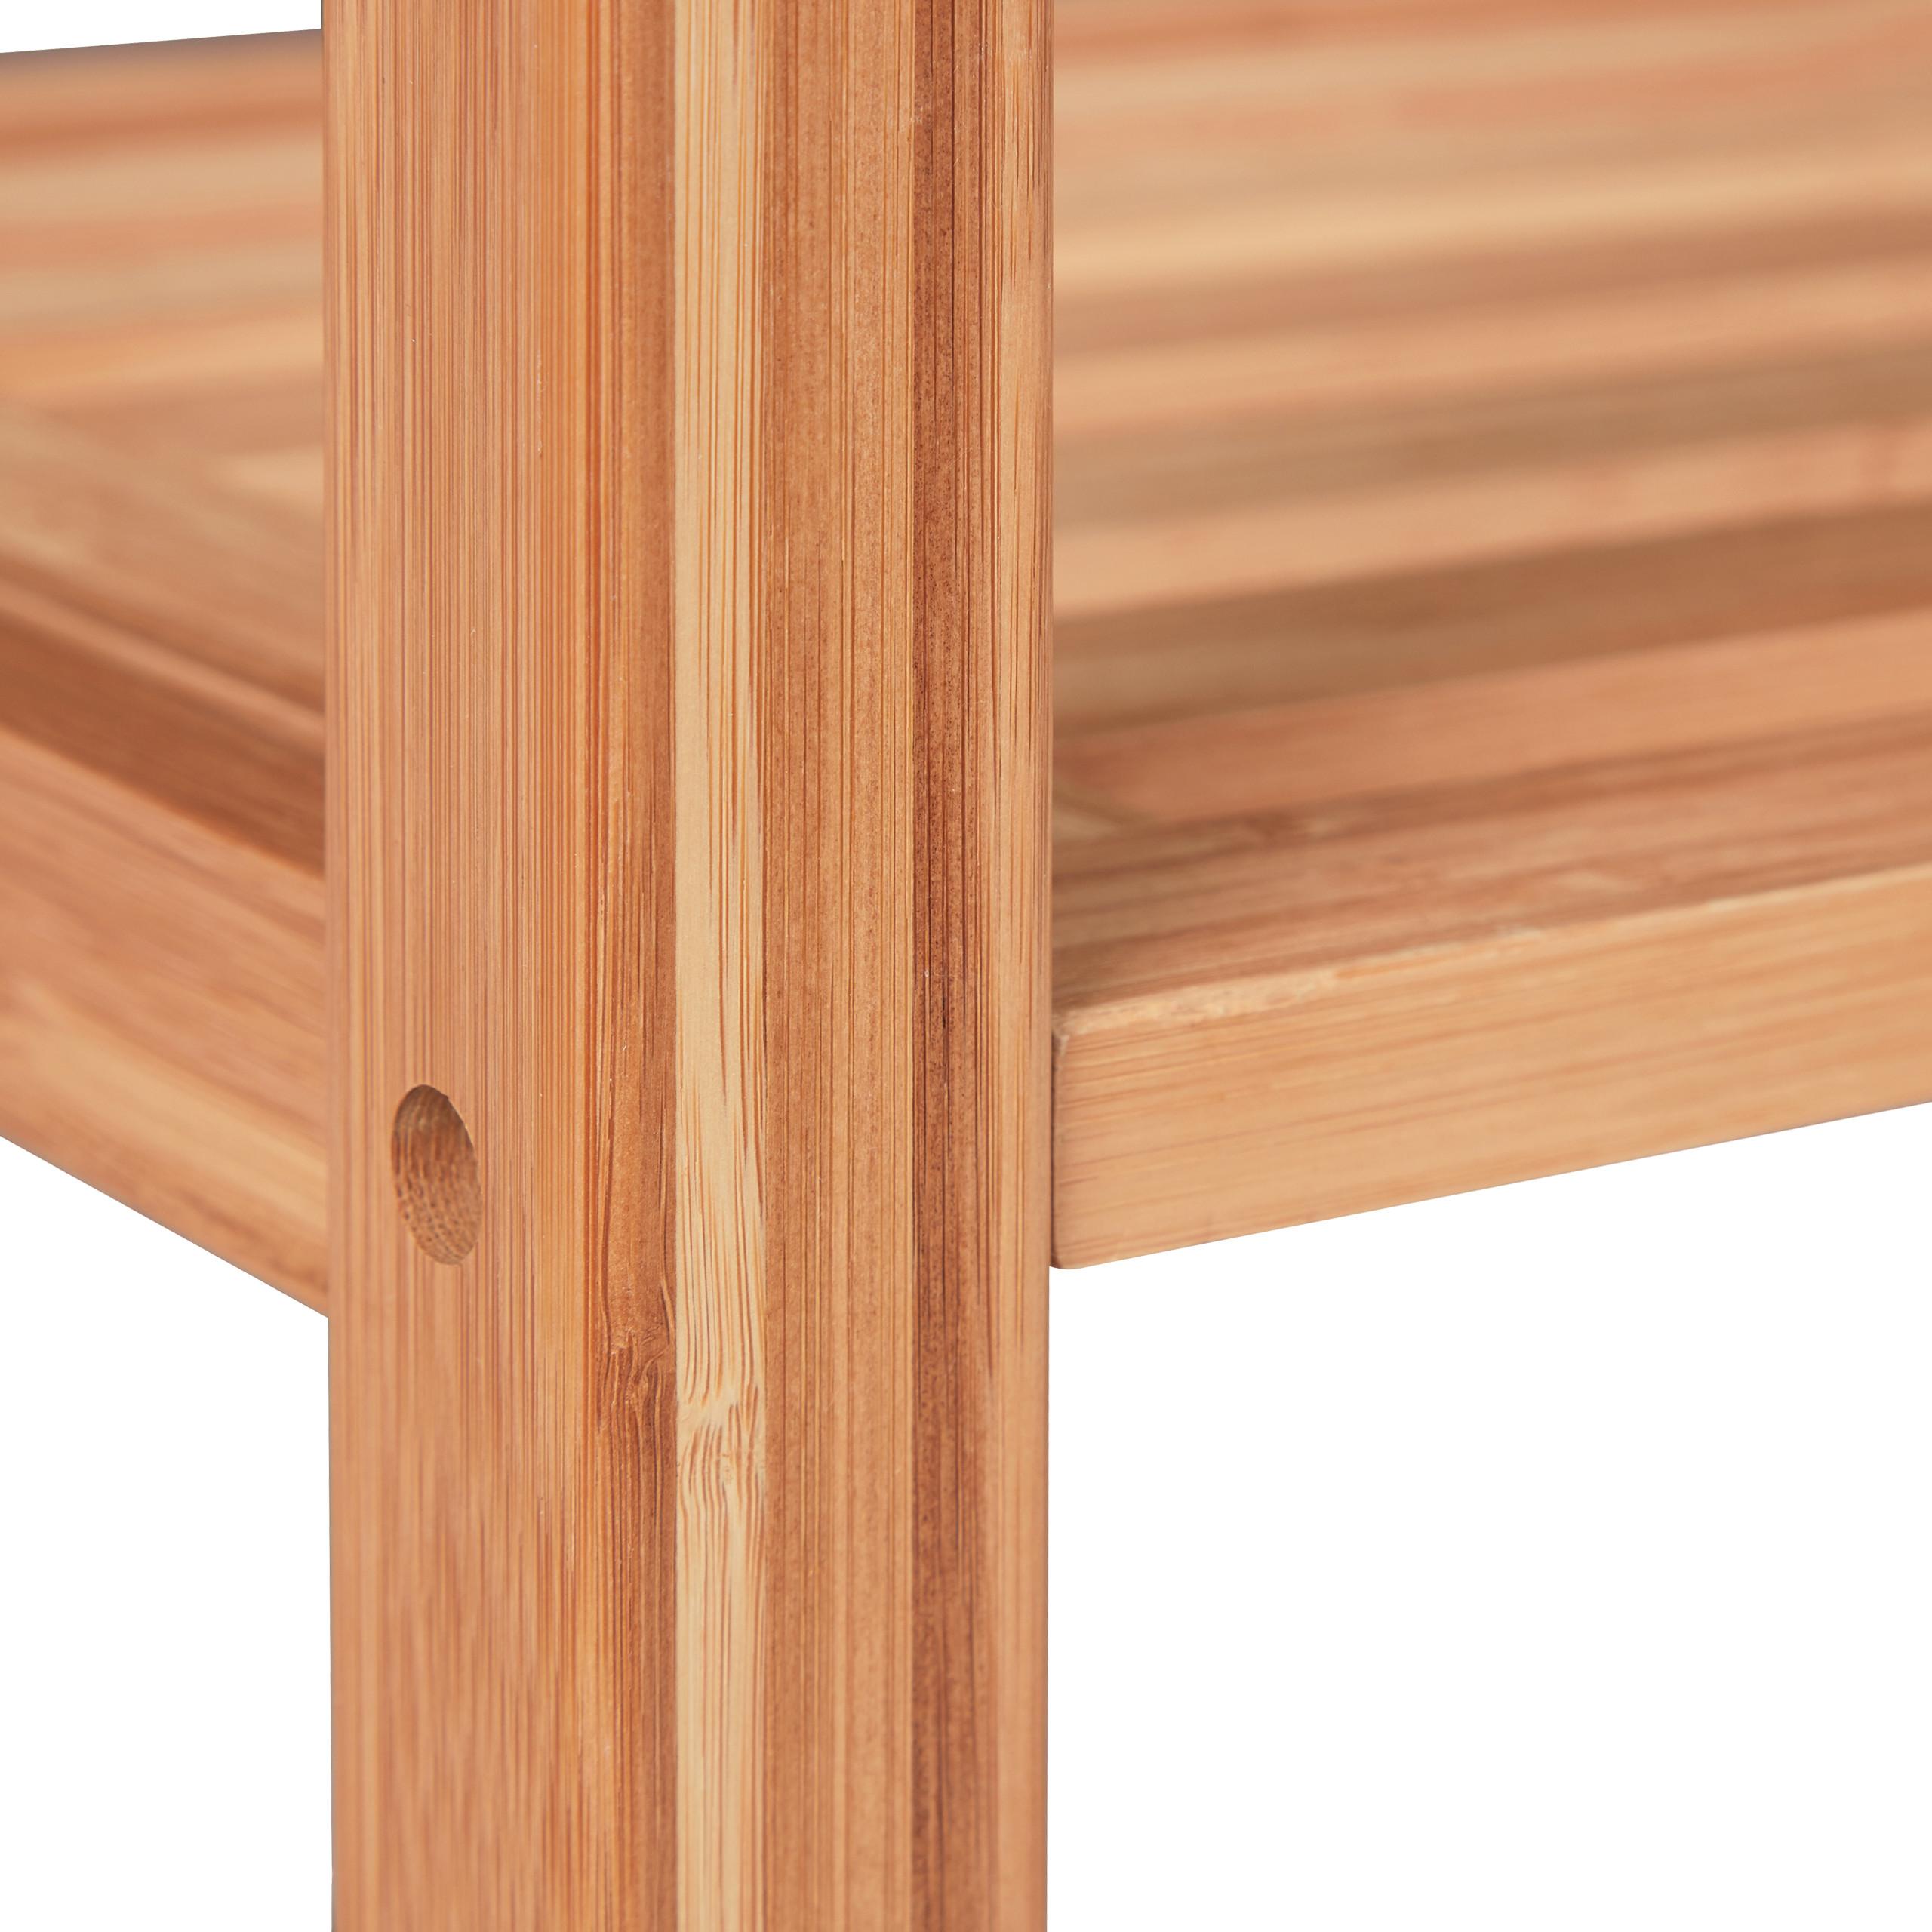 Bambusregal-Deluxe-Stehregal-natur-Standregal-Regal-Bambus-Lagerregal-Badregal Indexbild 22